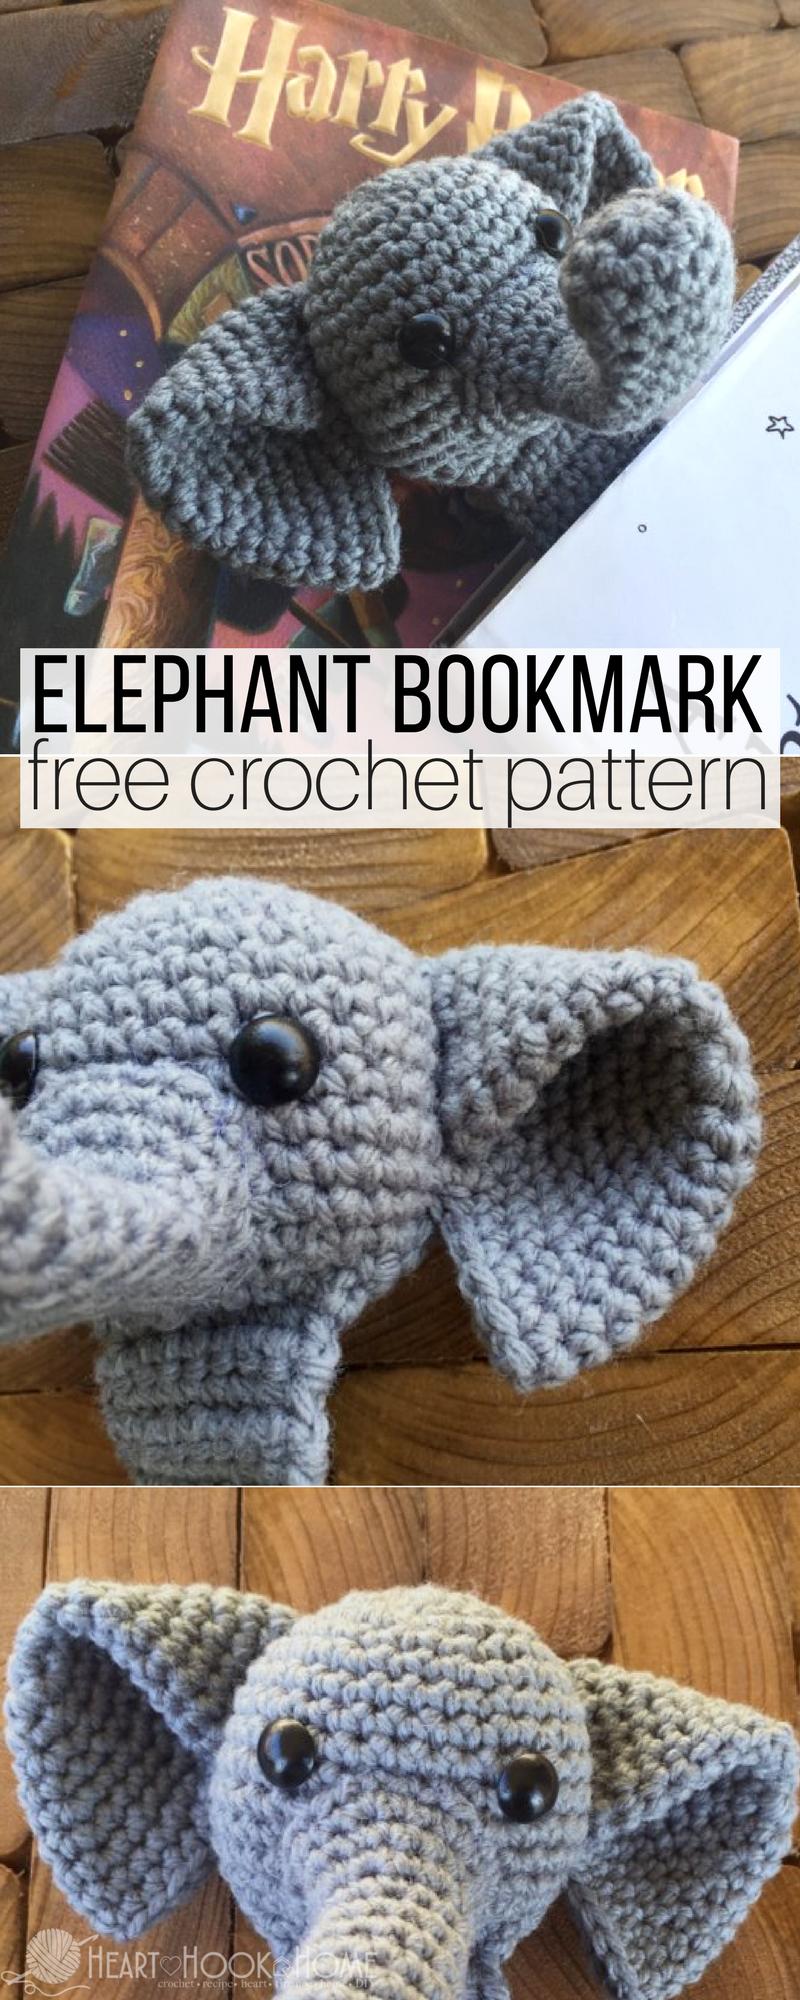 Webster the Elephant Bookmark Free Crochet Pattern | Pinterest ...